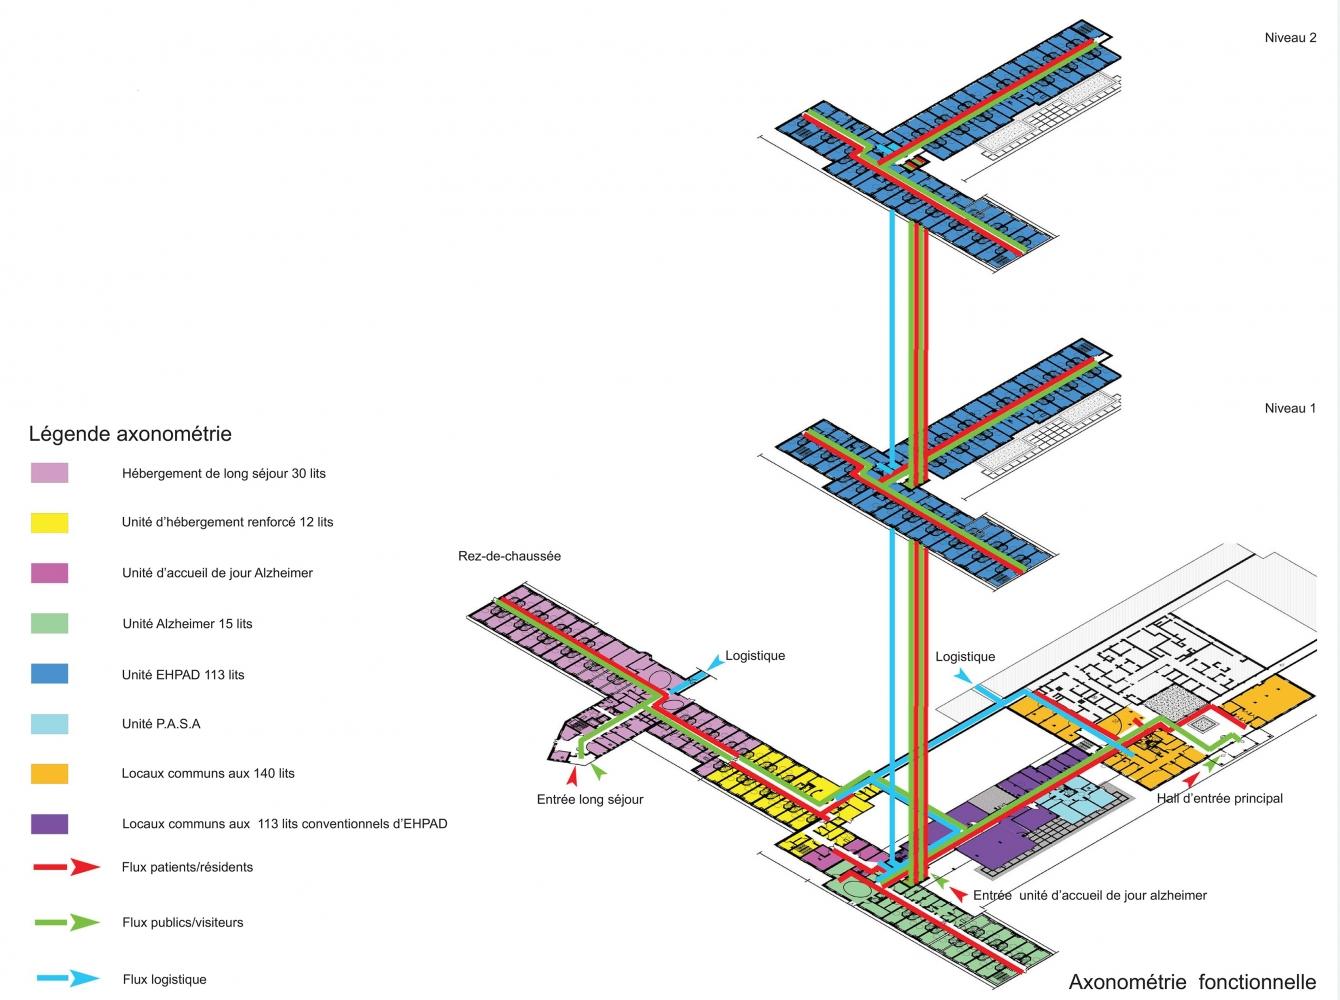 13-honfleur-img-005 Pascale SEURIN Architecte - Pascale SEURIN Architecte